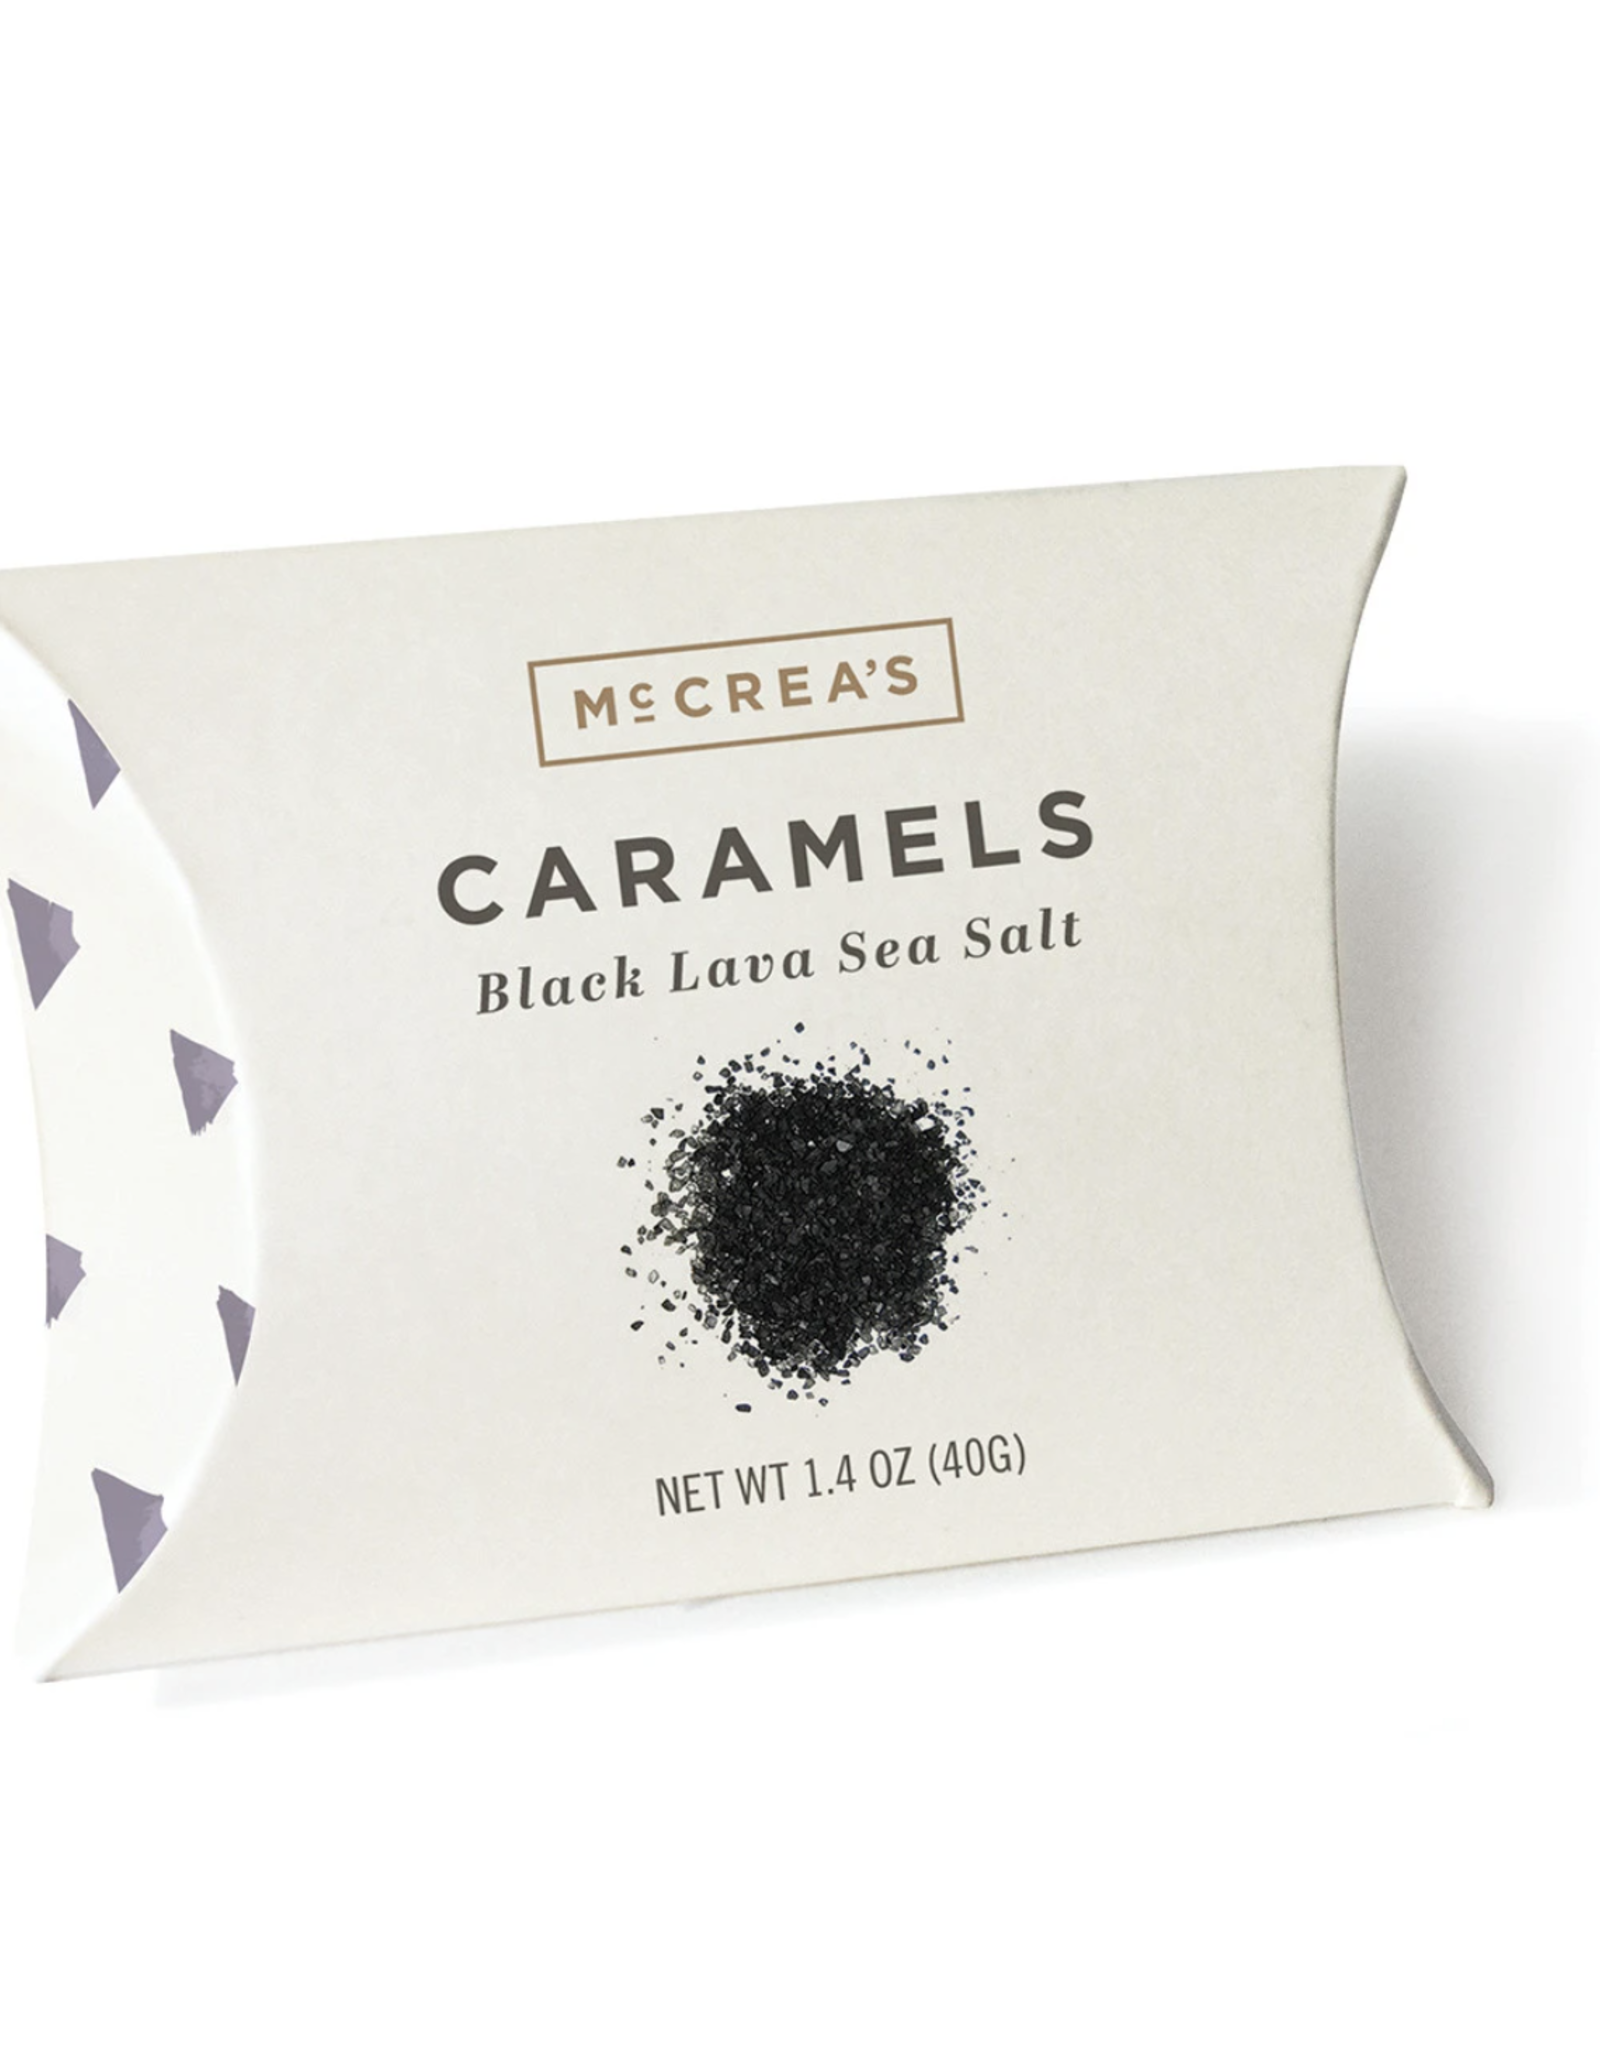 McCrea's Candies 1.4oz Pillows Black Lava Sea Salt